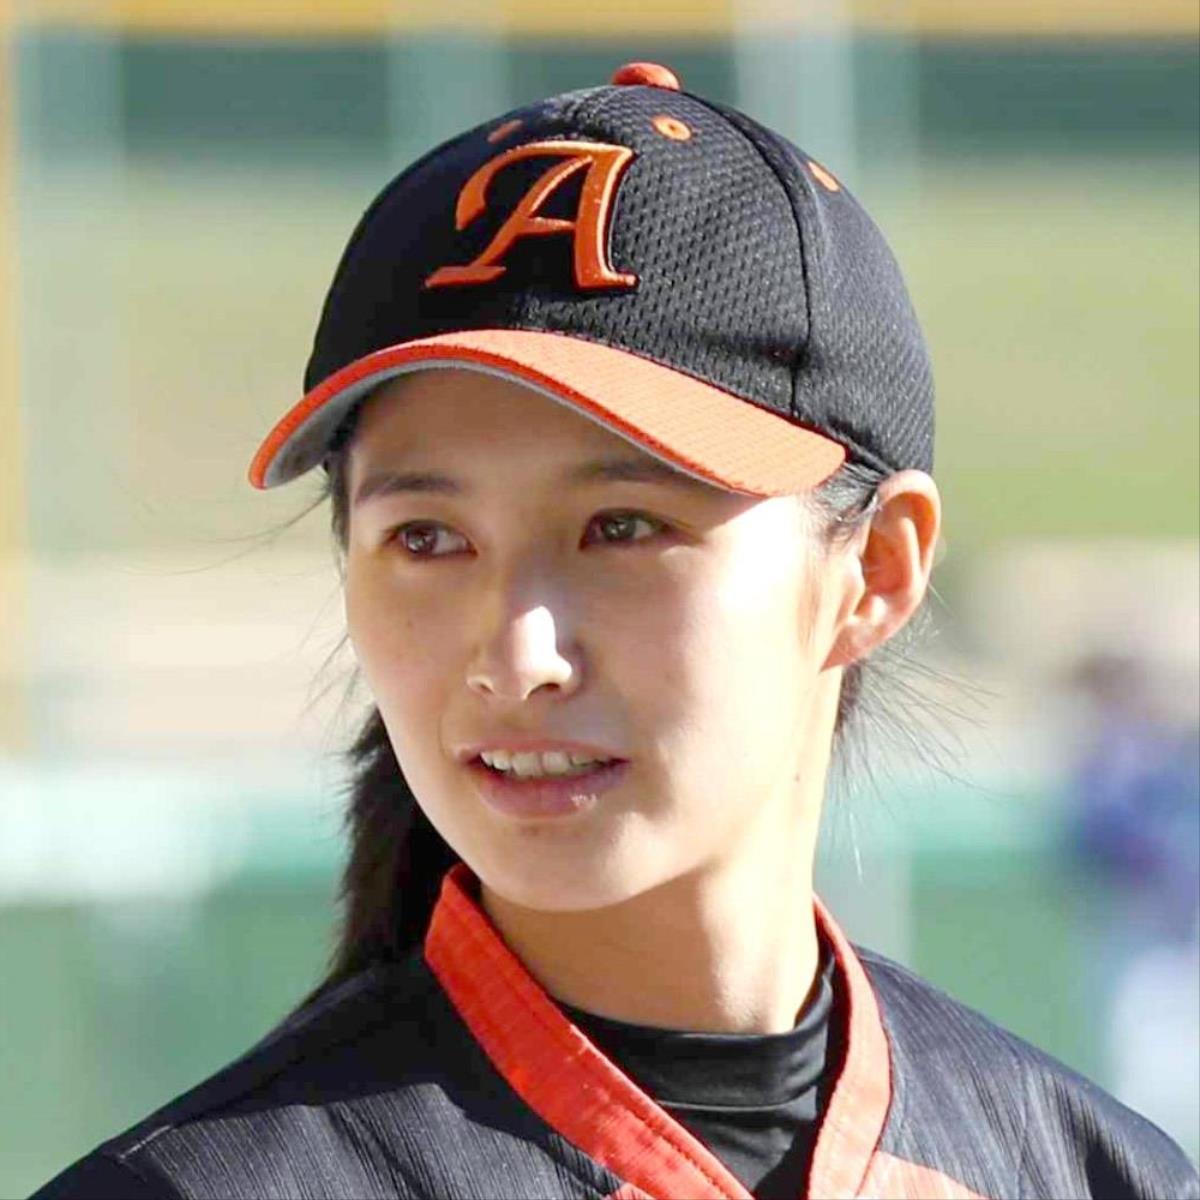 DeNAの「ベースボールスクールコーチ」に就任した加藤優